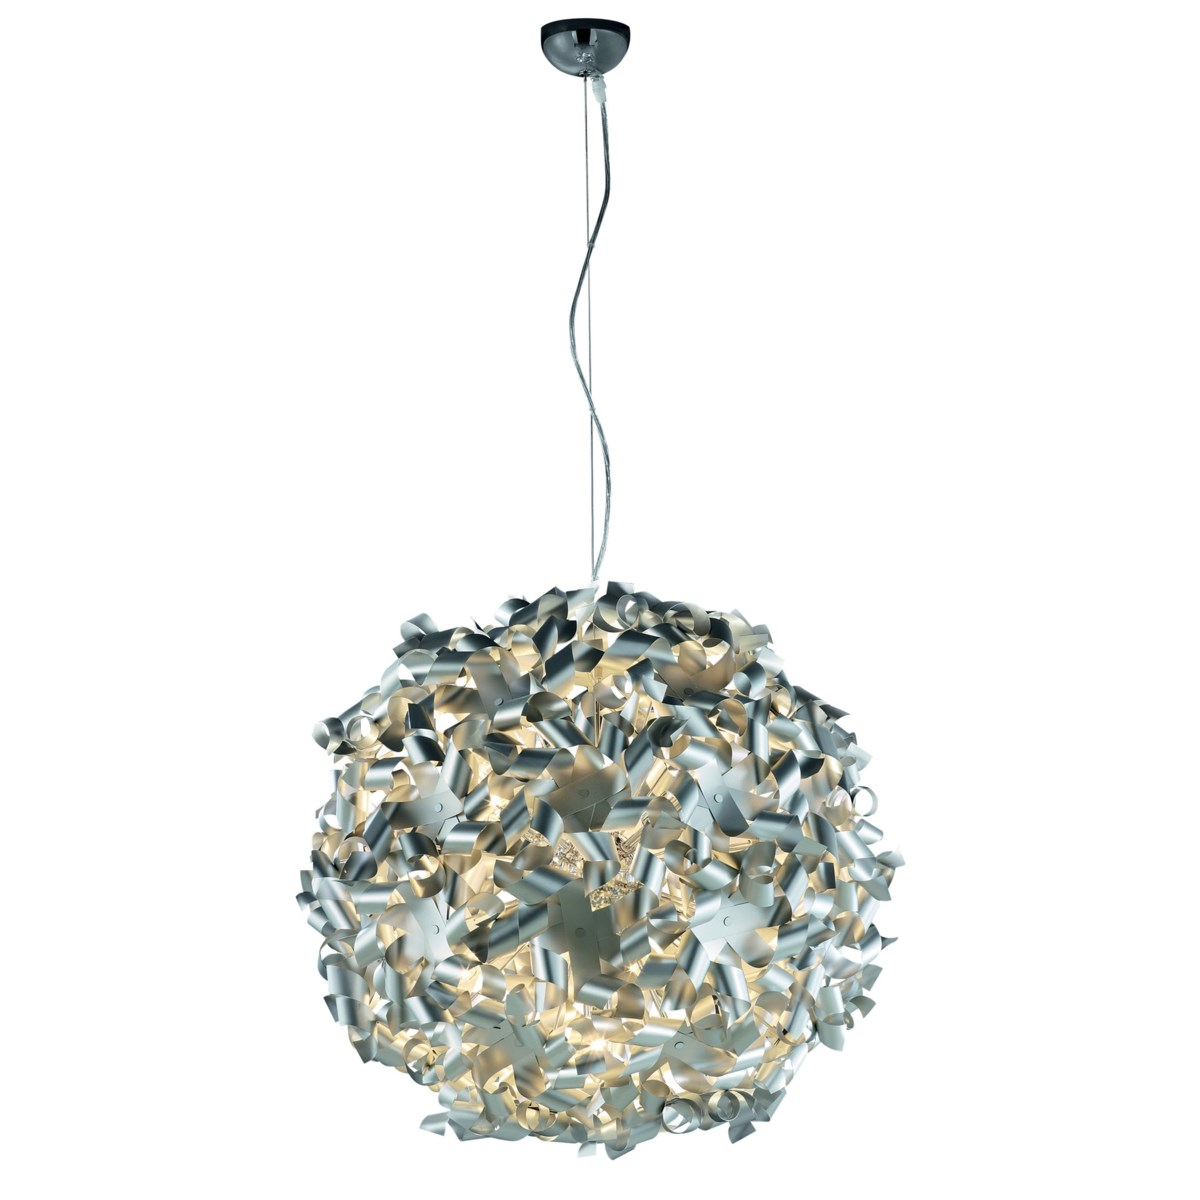 Pinwheel Pendant in Brushed Aluminum